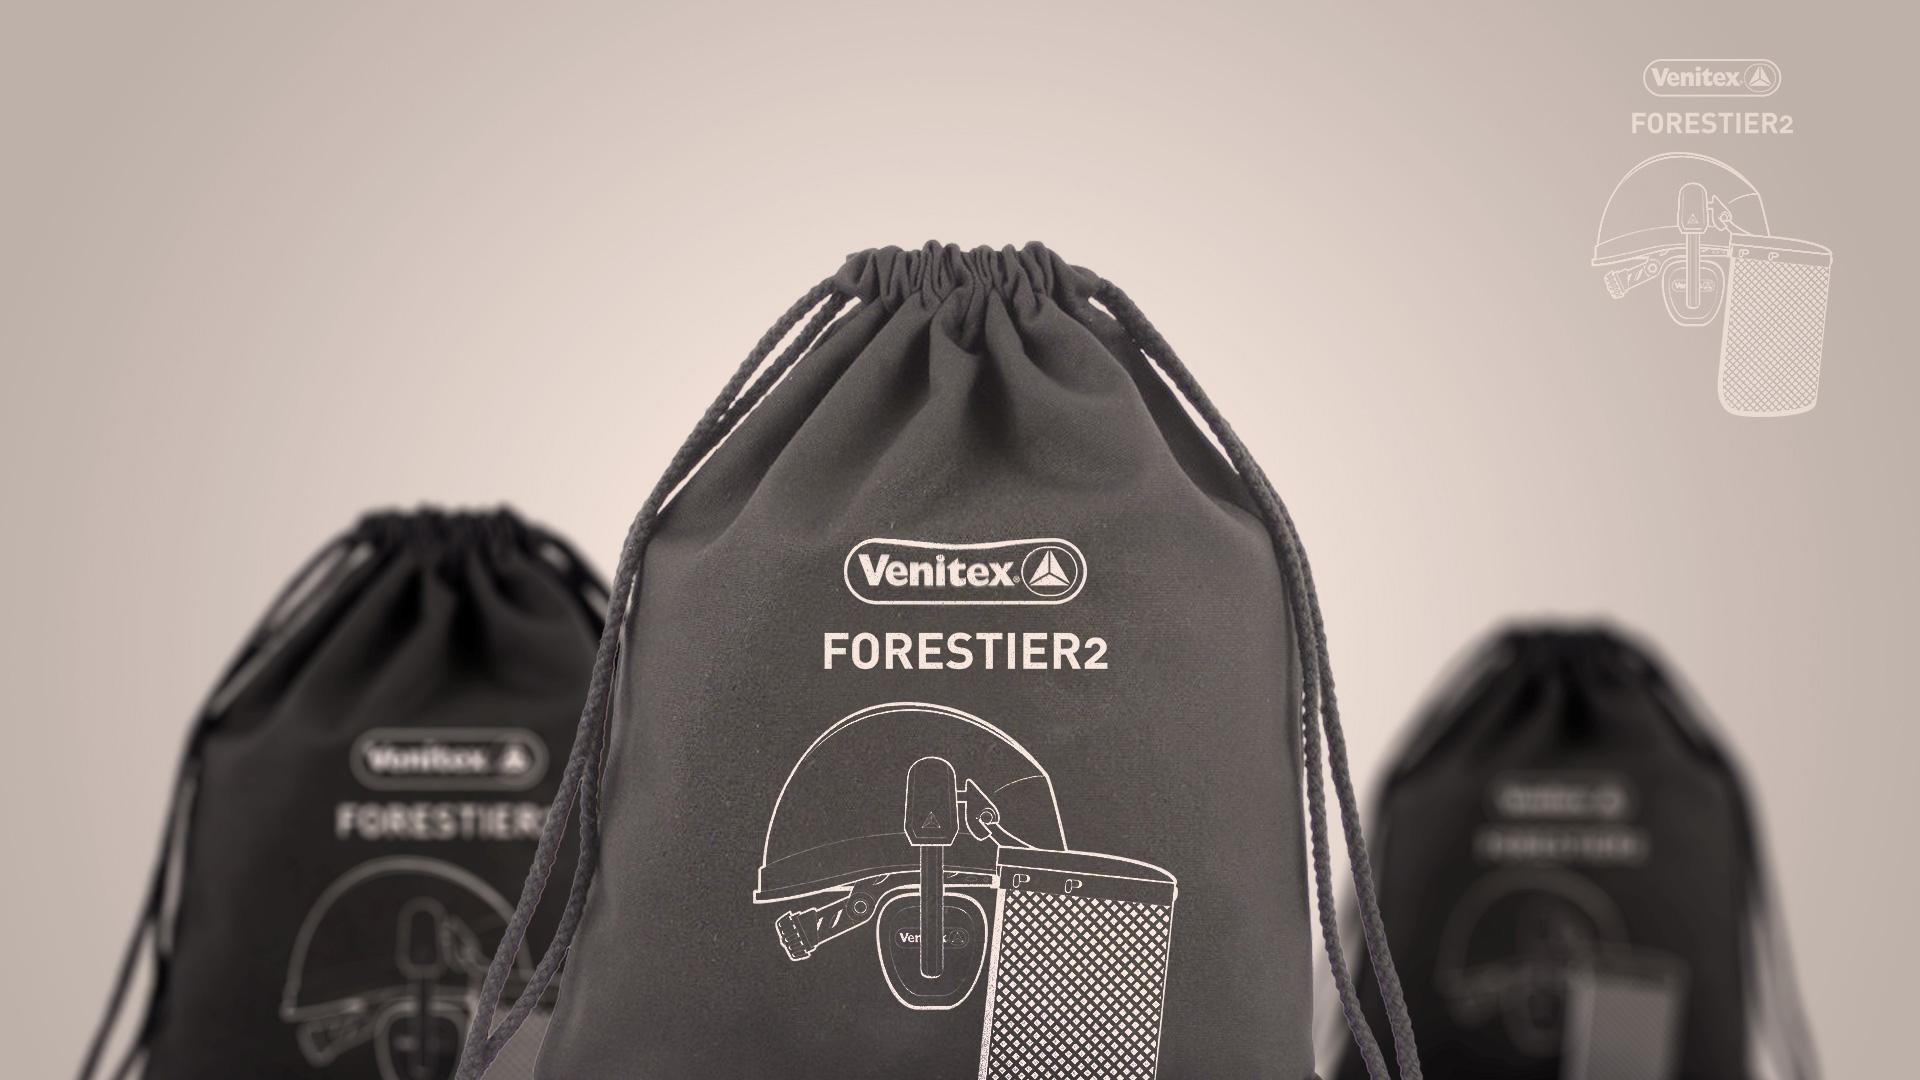 Packagings : marquage sur sac noir Venitex